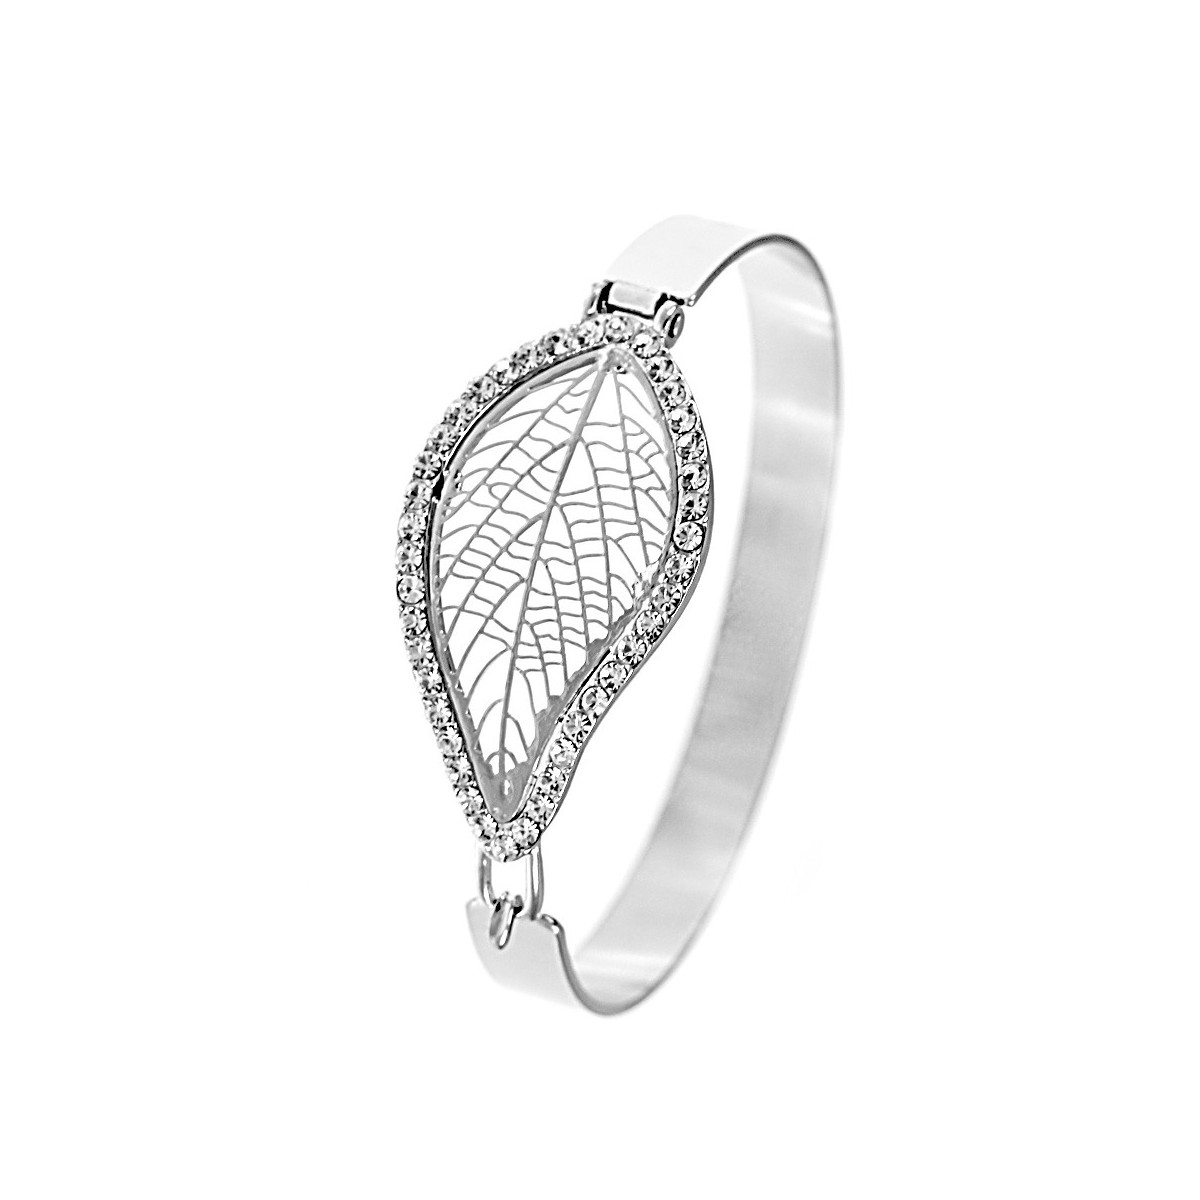 Bracelet feuille filigrane argenté So Charm made with crystal from Swarovski